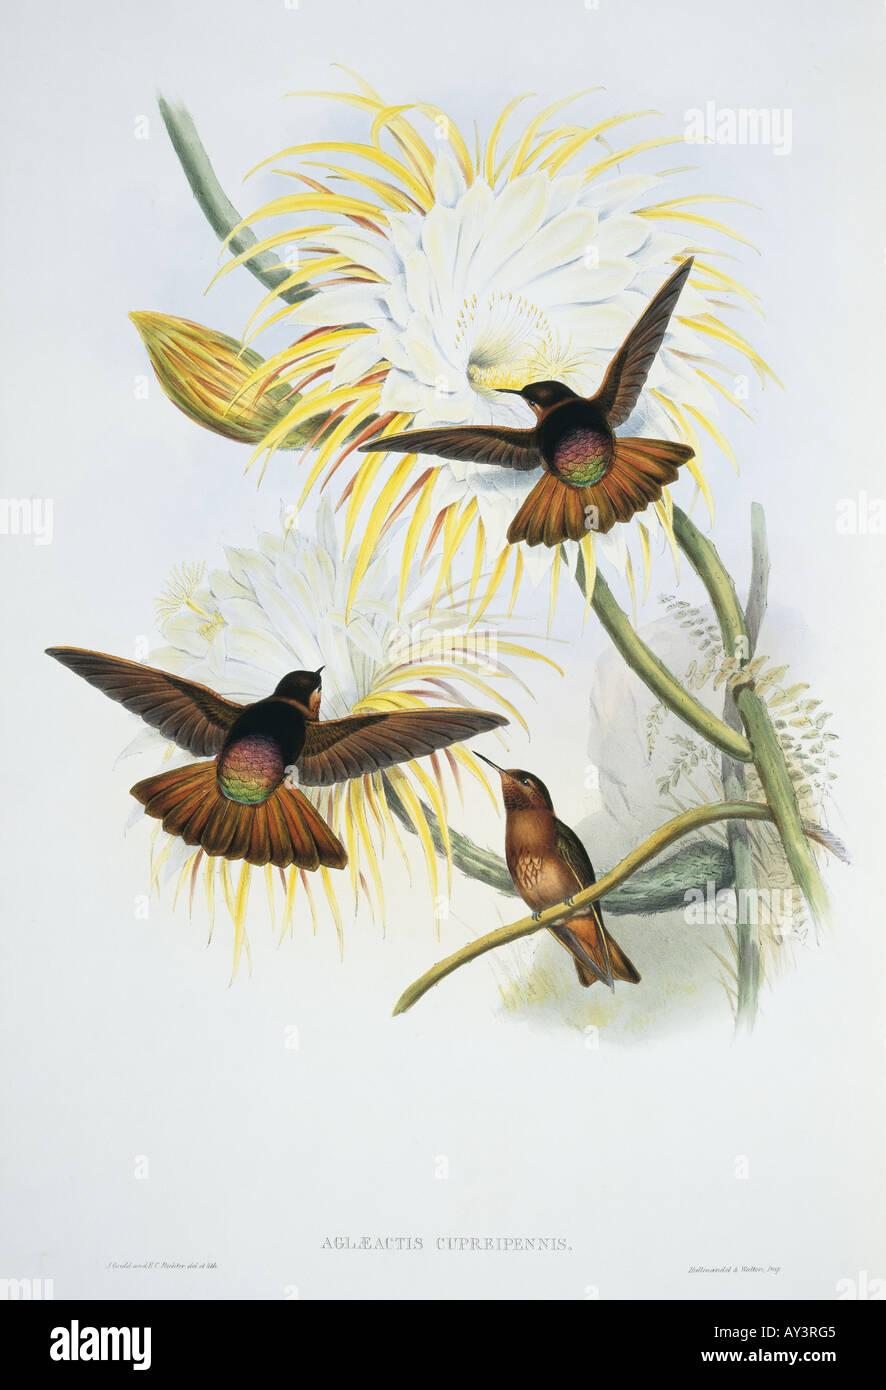 Aglaeactis cupripennis shining sunbeam - Stock Image